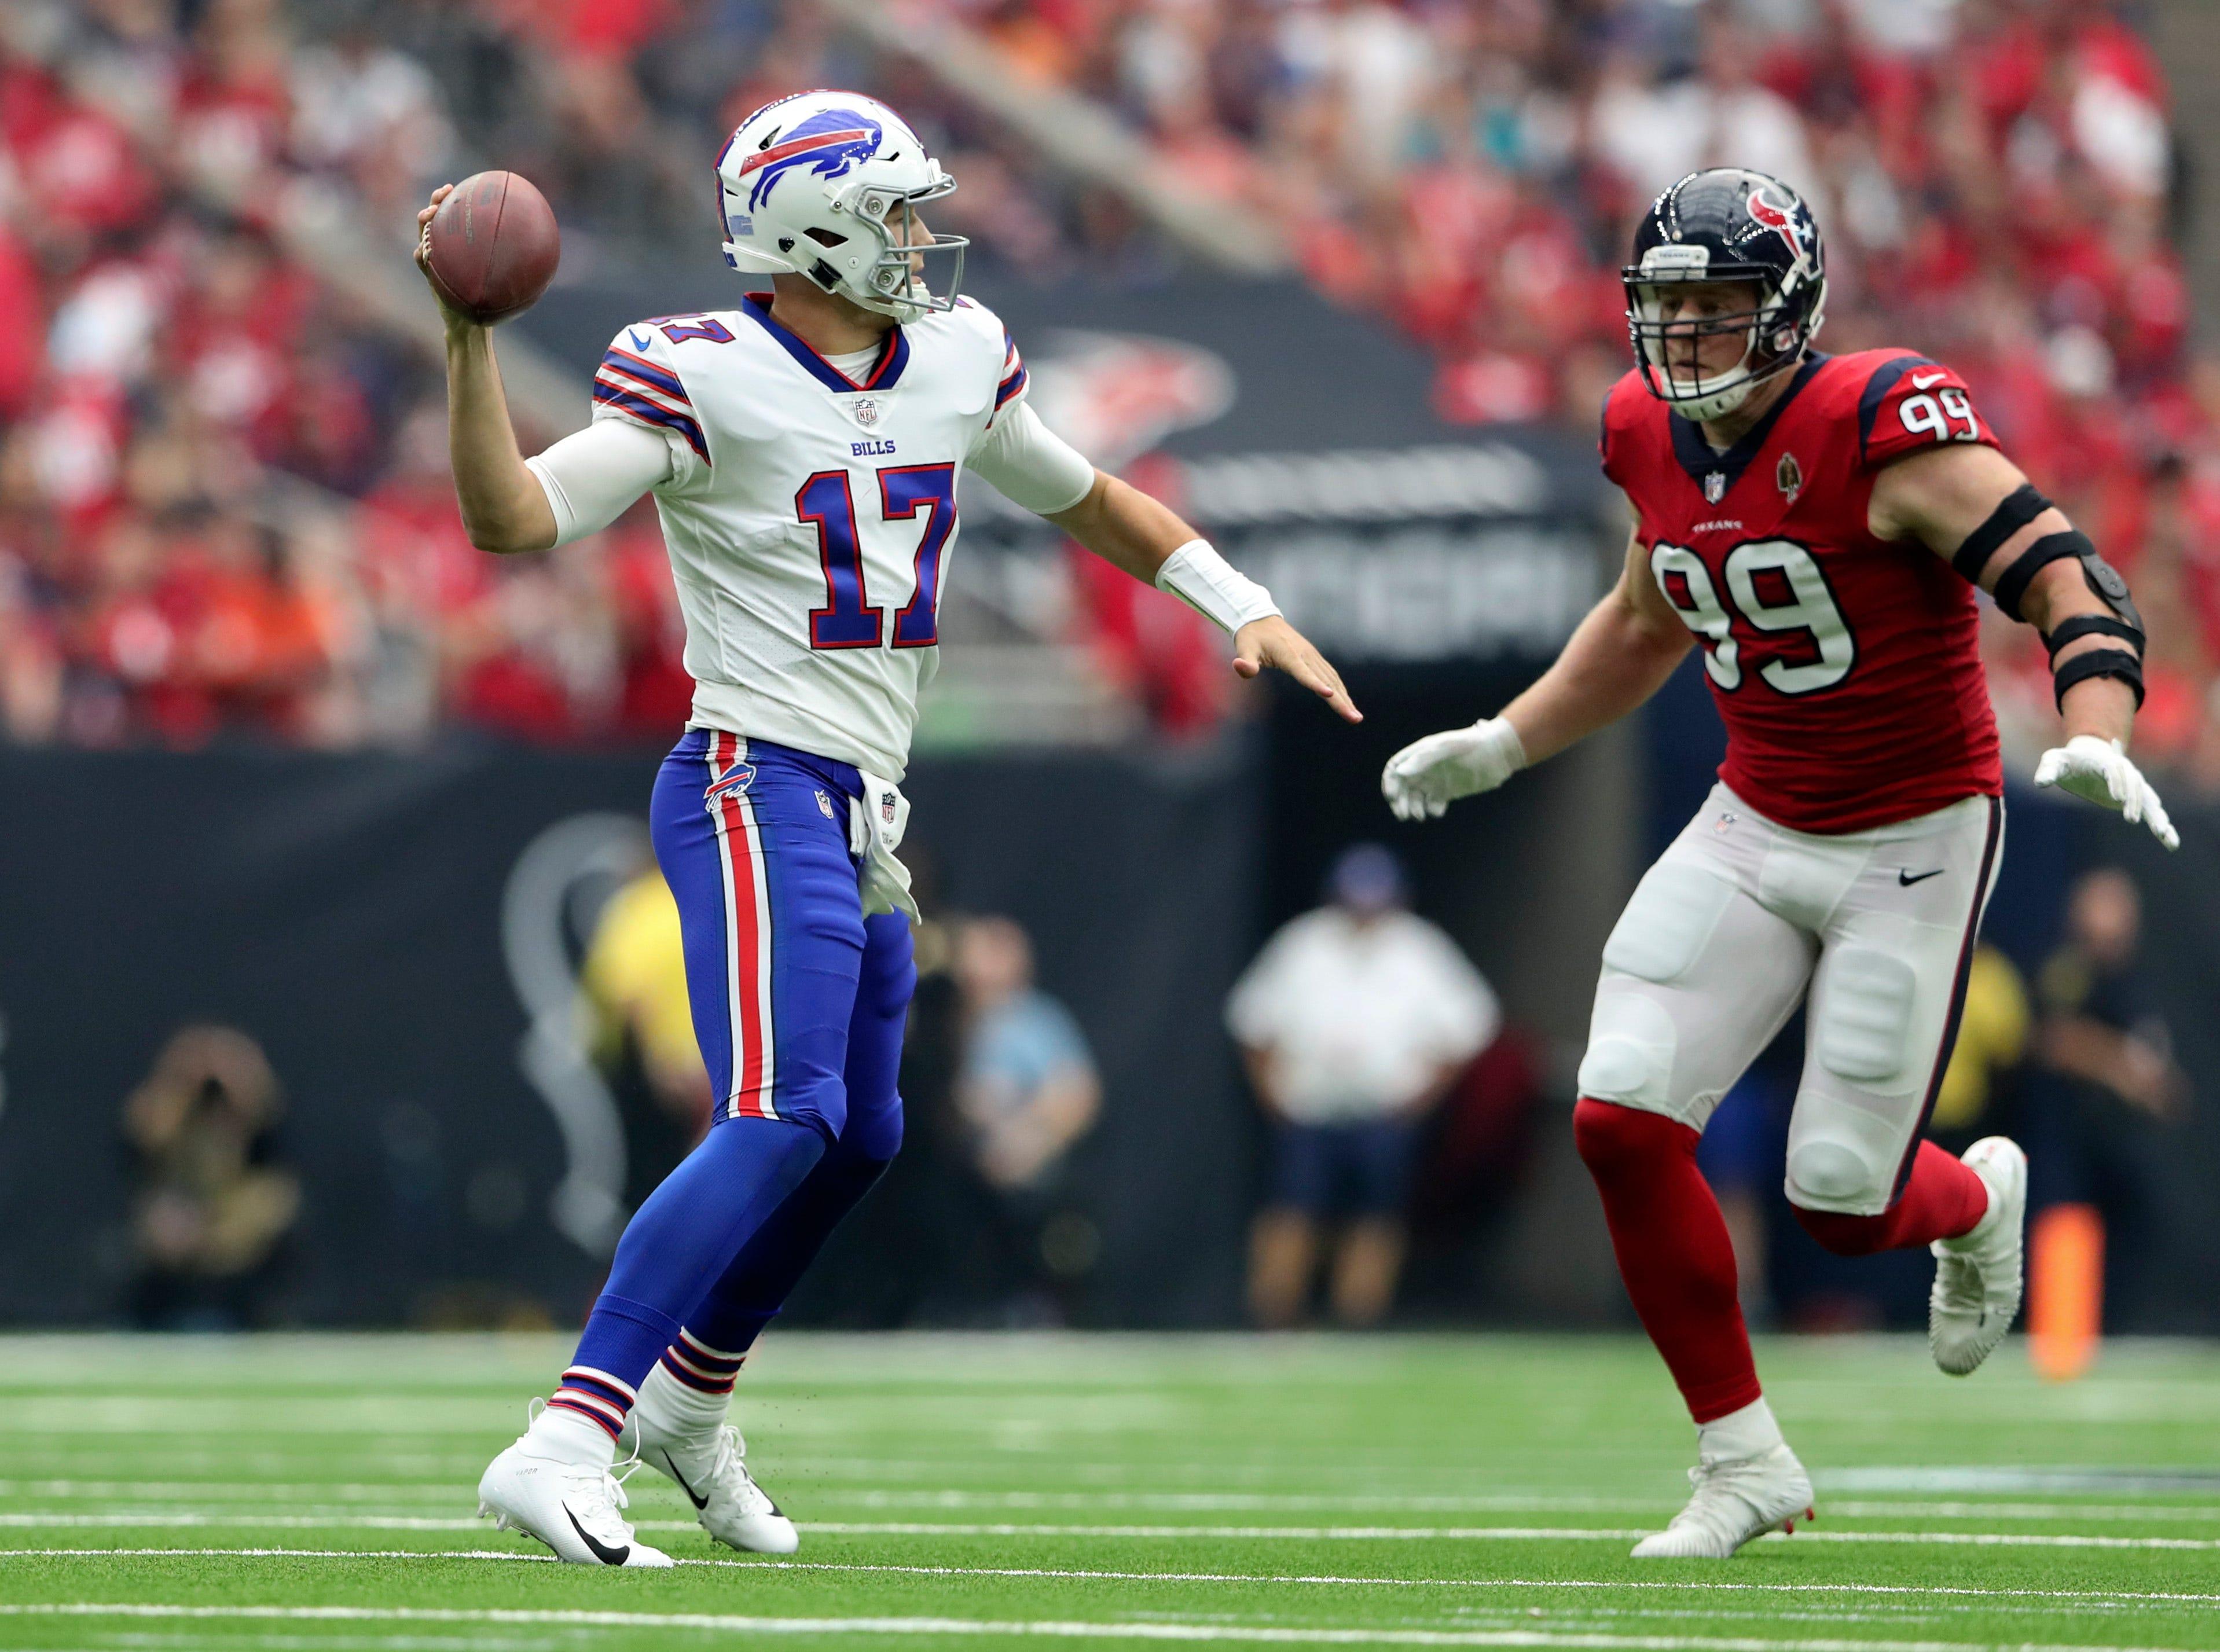 Oct 14, 2018; Houston, TX, USA; Houston Texans defensive end J.J. Watt (99) chases Buffalo Bills quarterback Josh Allen (17) during the second quarter at NRG Stadium. Mandatory Credit: Kevin Jairaj-USA TODAY Sports